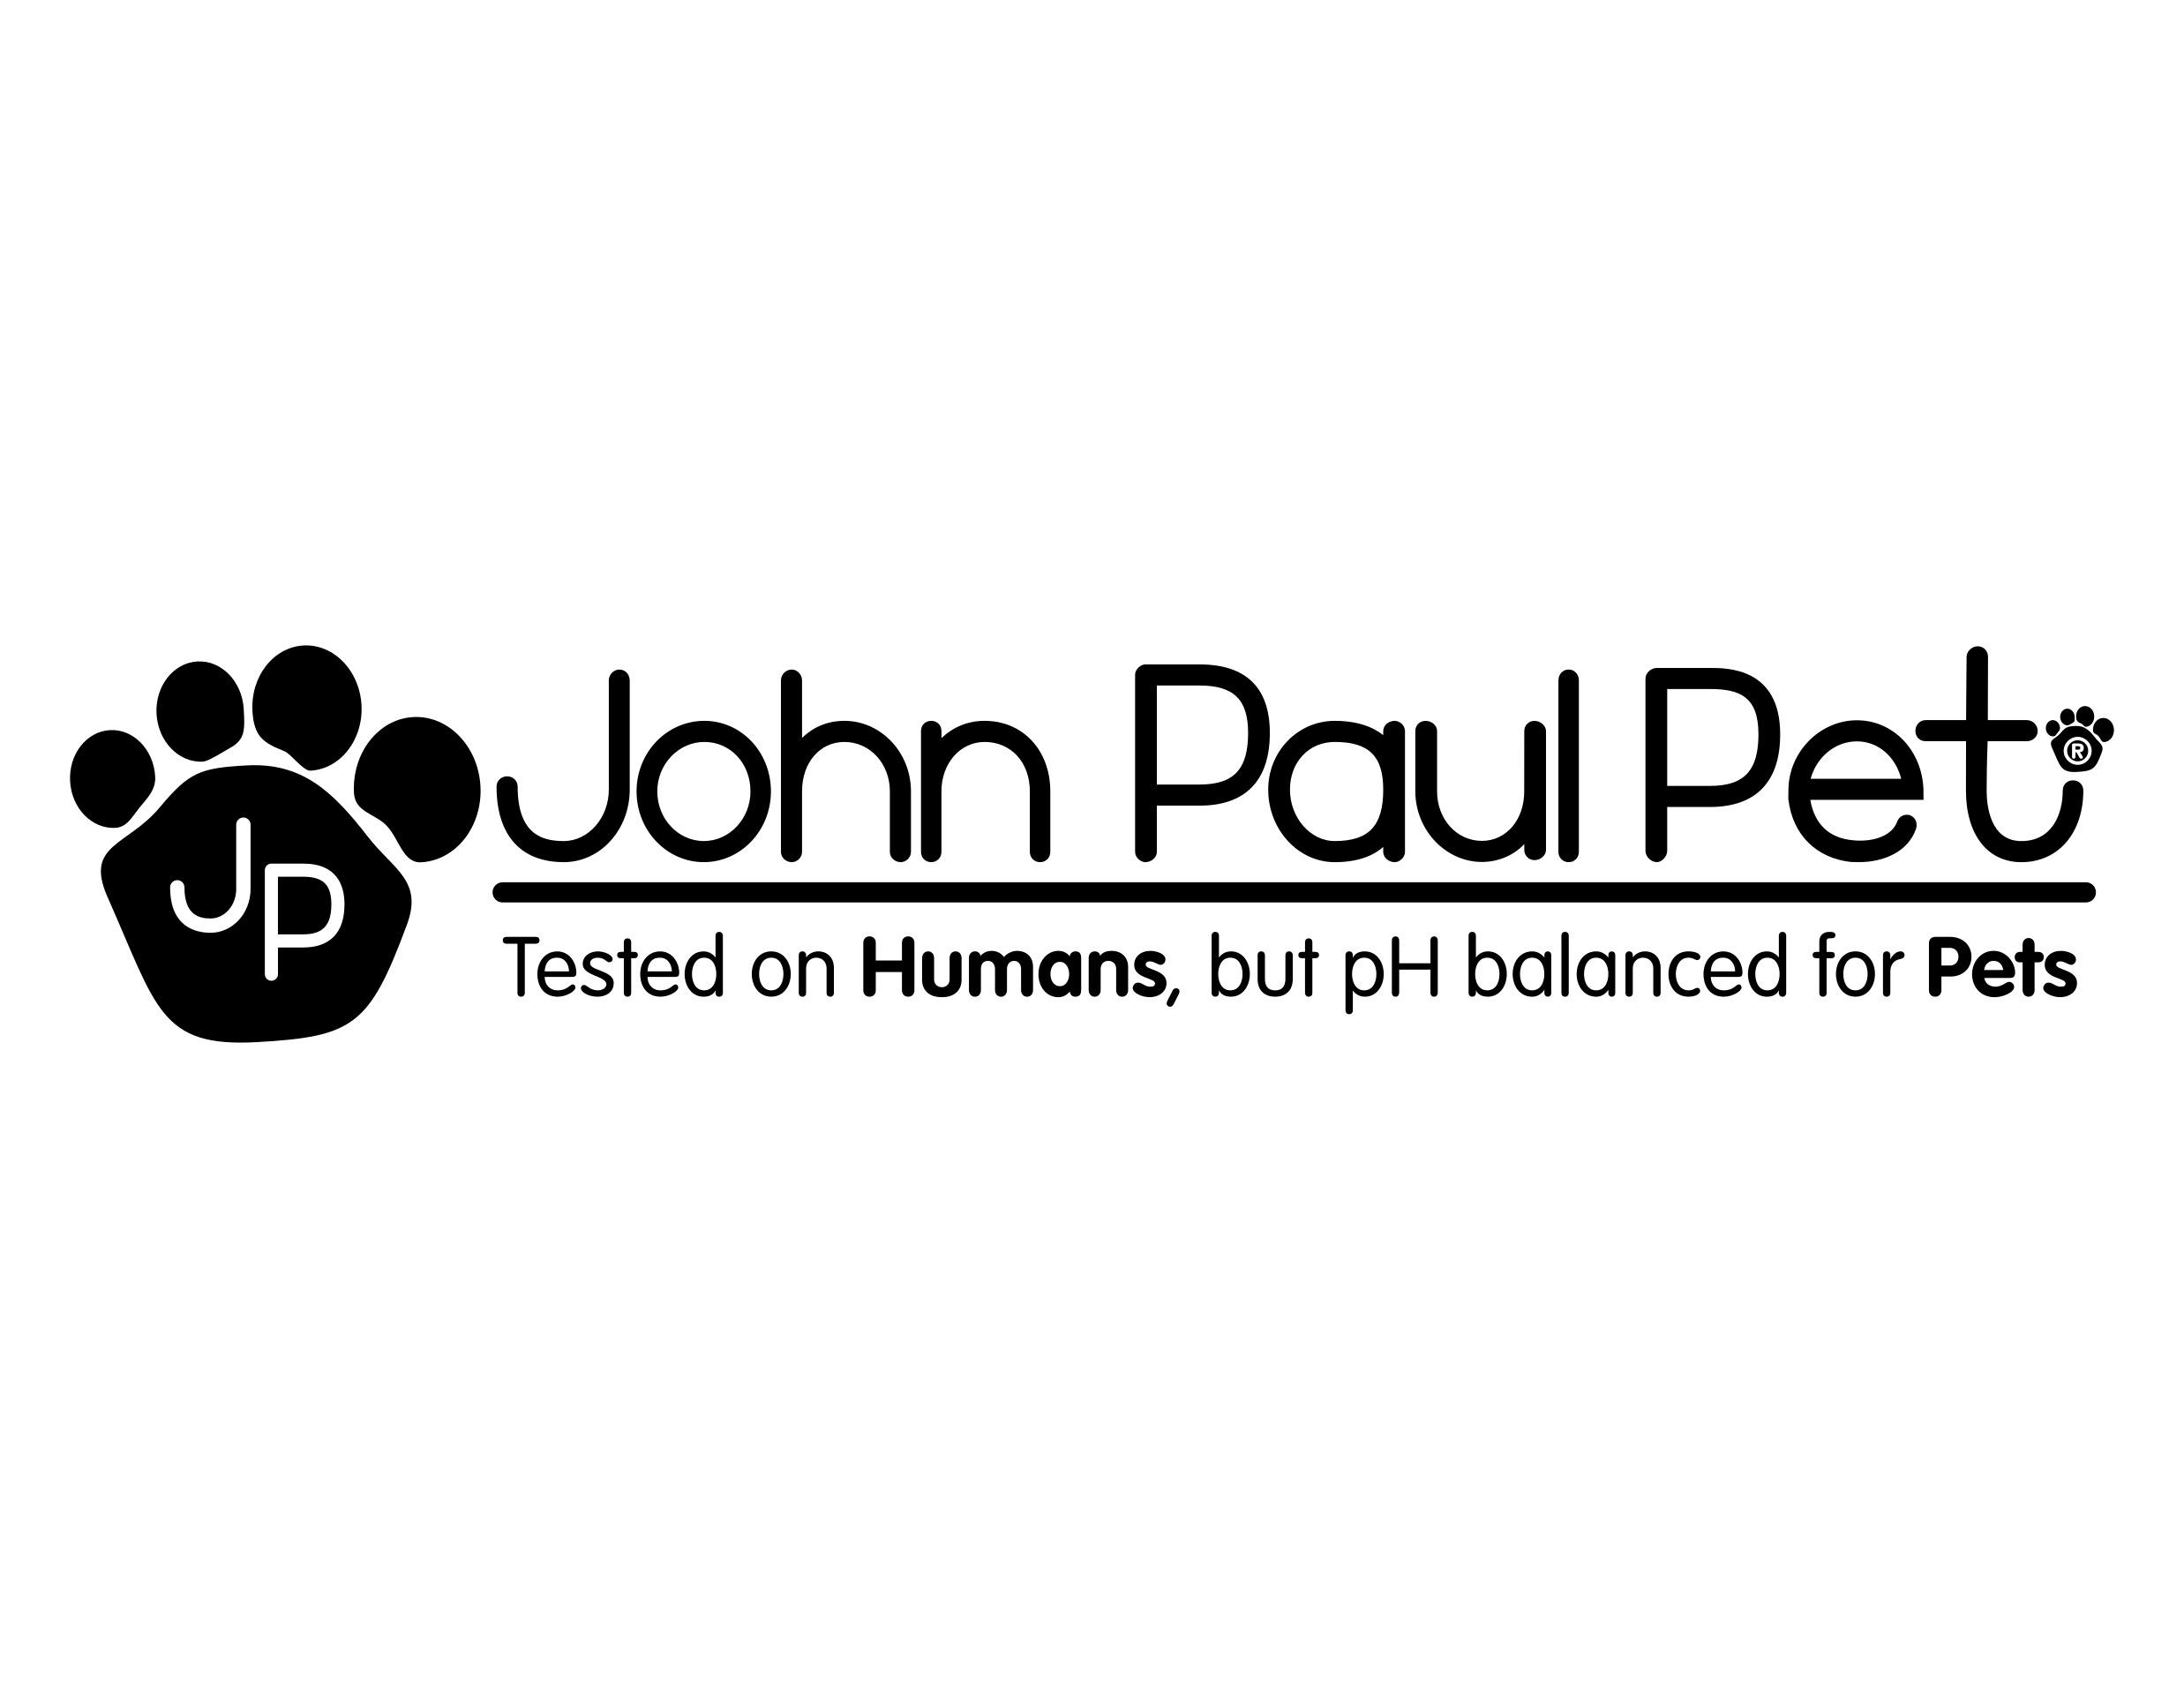 Jean Paul Pet